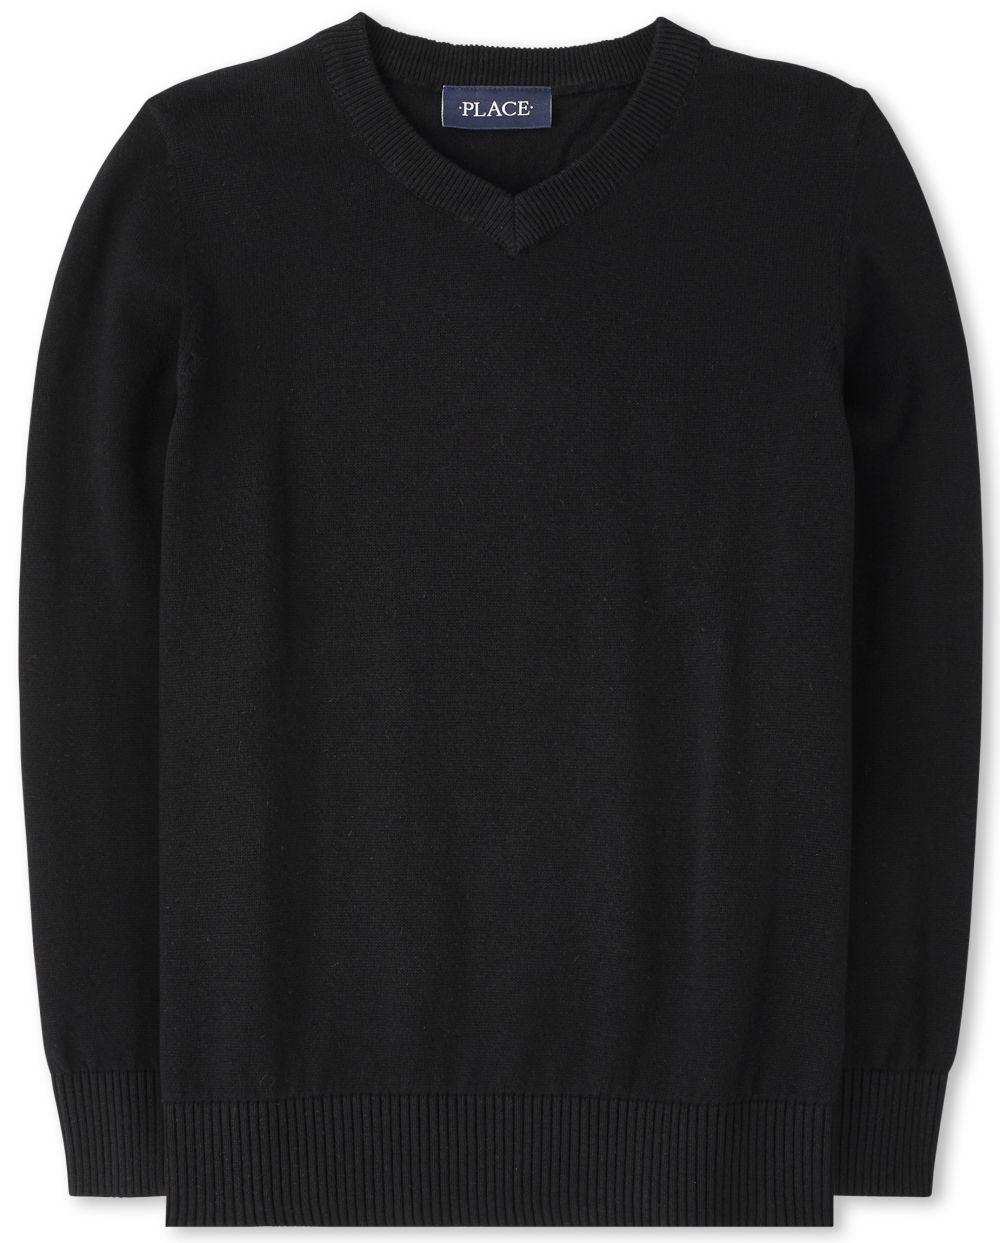 Boys Uniform V Neck Sweater